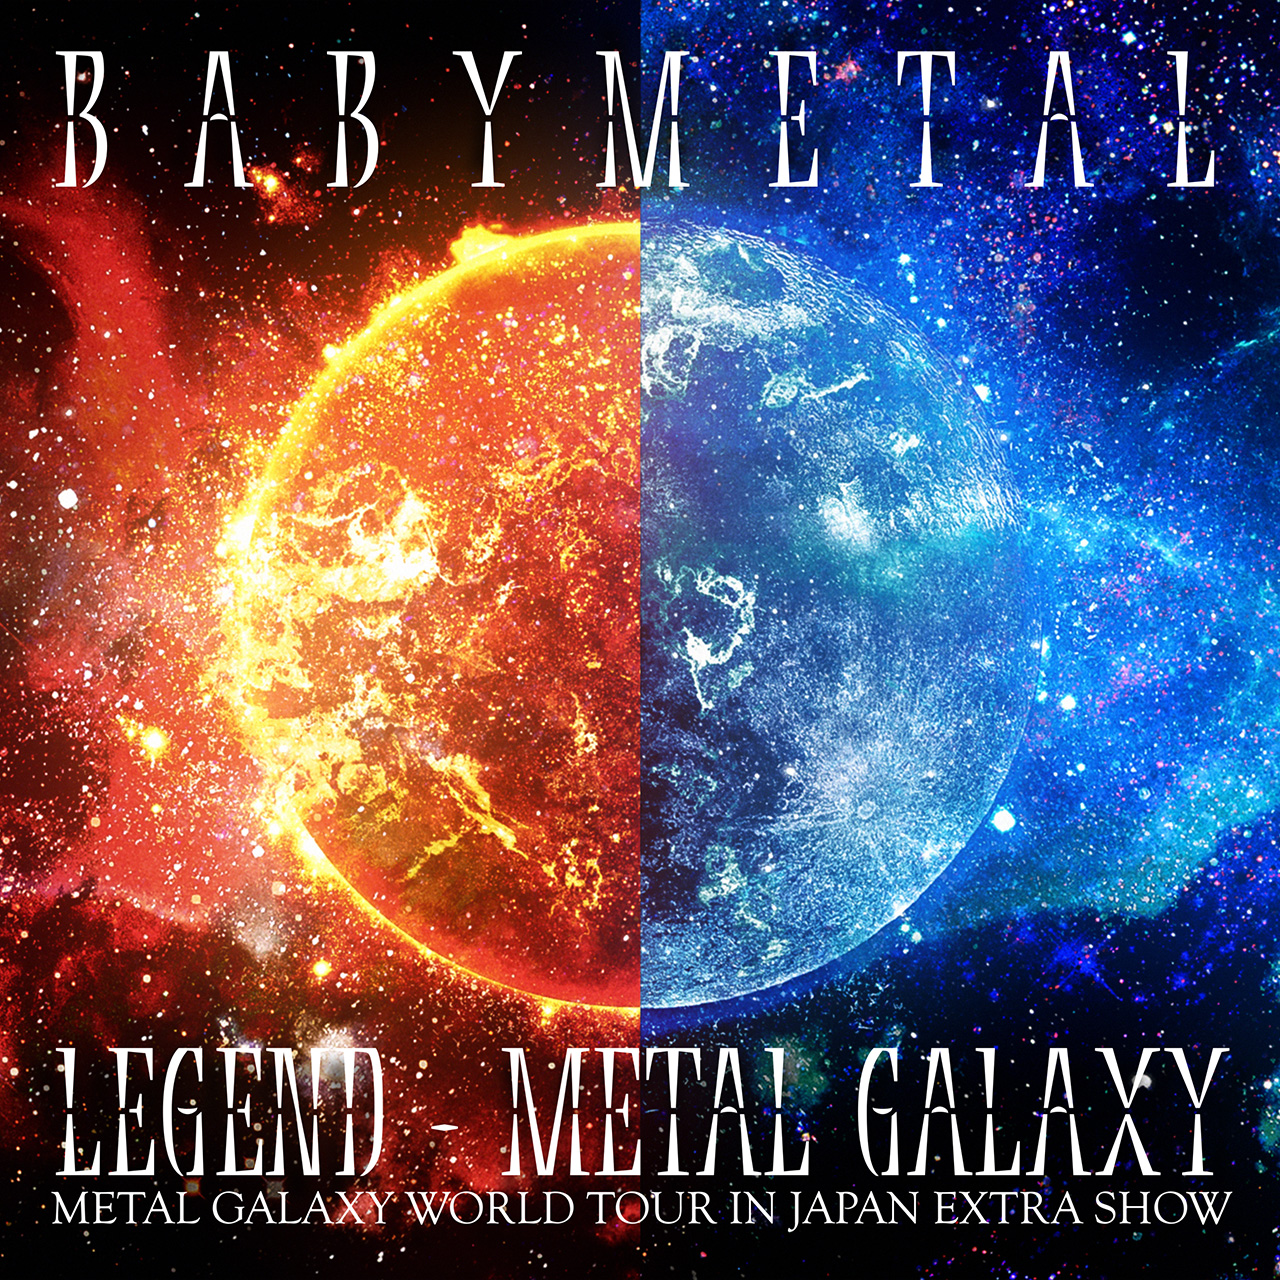 BABYMETAL - LEGEND - METAL GALAXY (METAL GALAXY WORLD TOUR IN JAPAN EXTRA SHOW) Day 1 & 2 [2020.09.09+MP3+RAR]